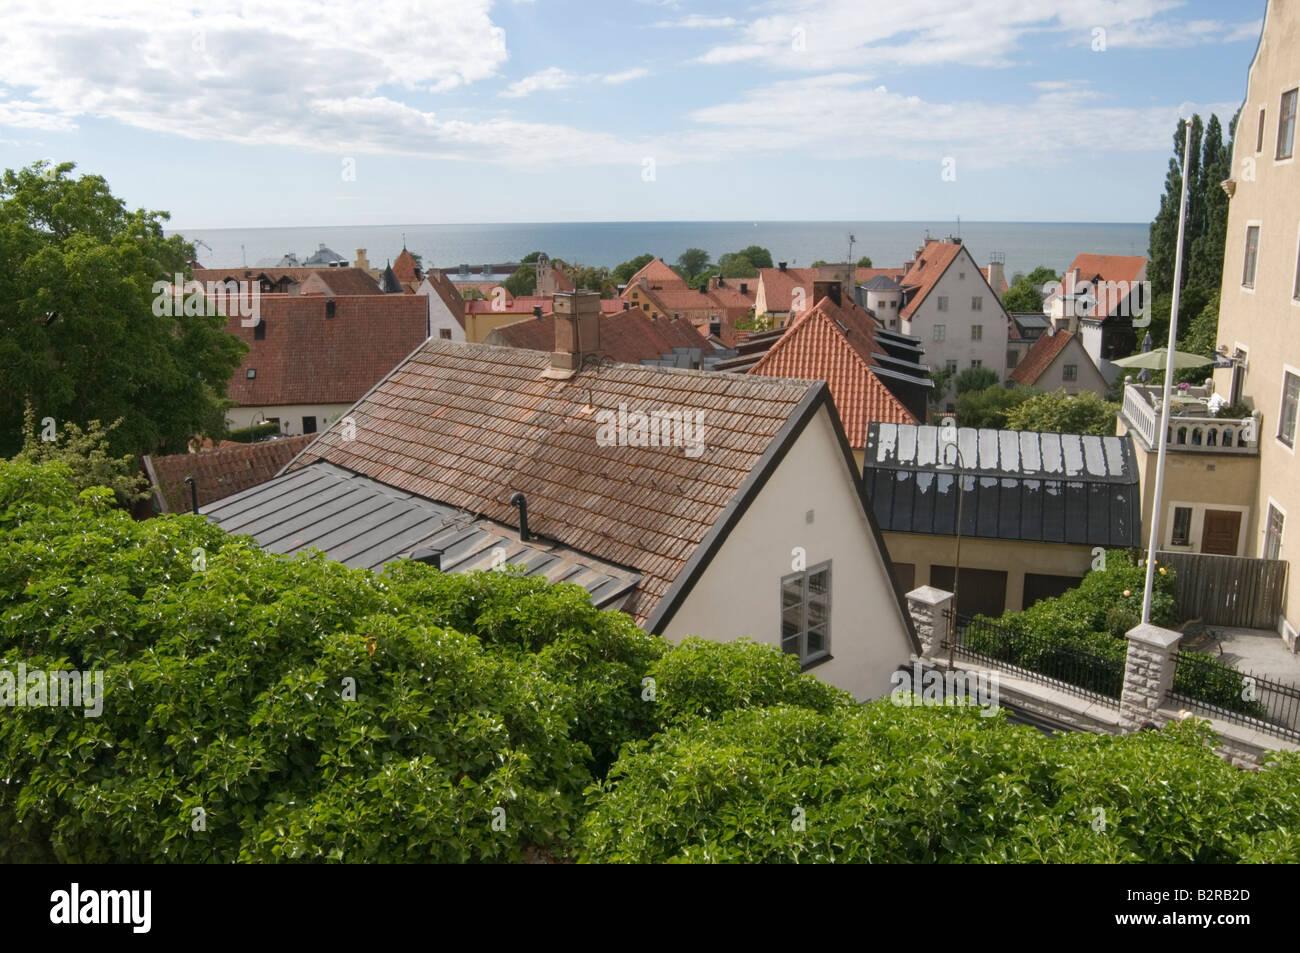 Traditional Swedish Houses On Gotland Island Stock Photo Royalty - Traditional swedish homes